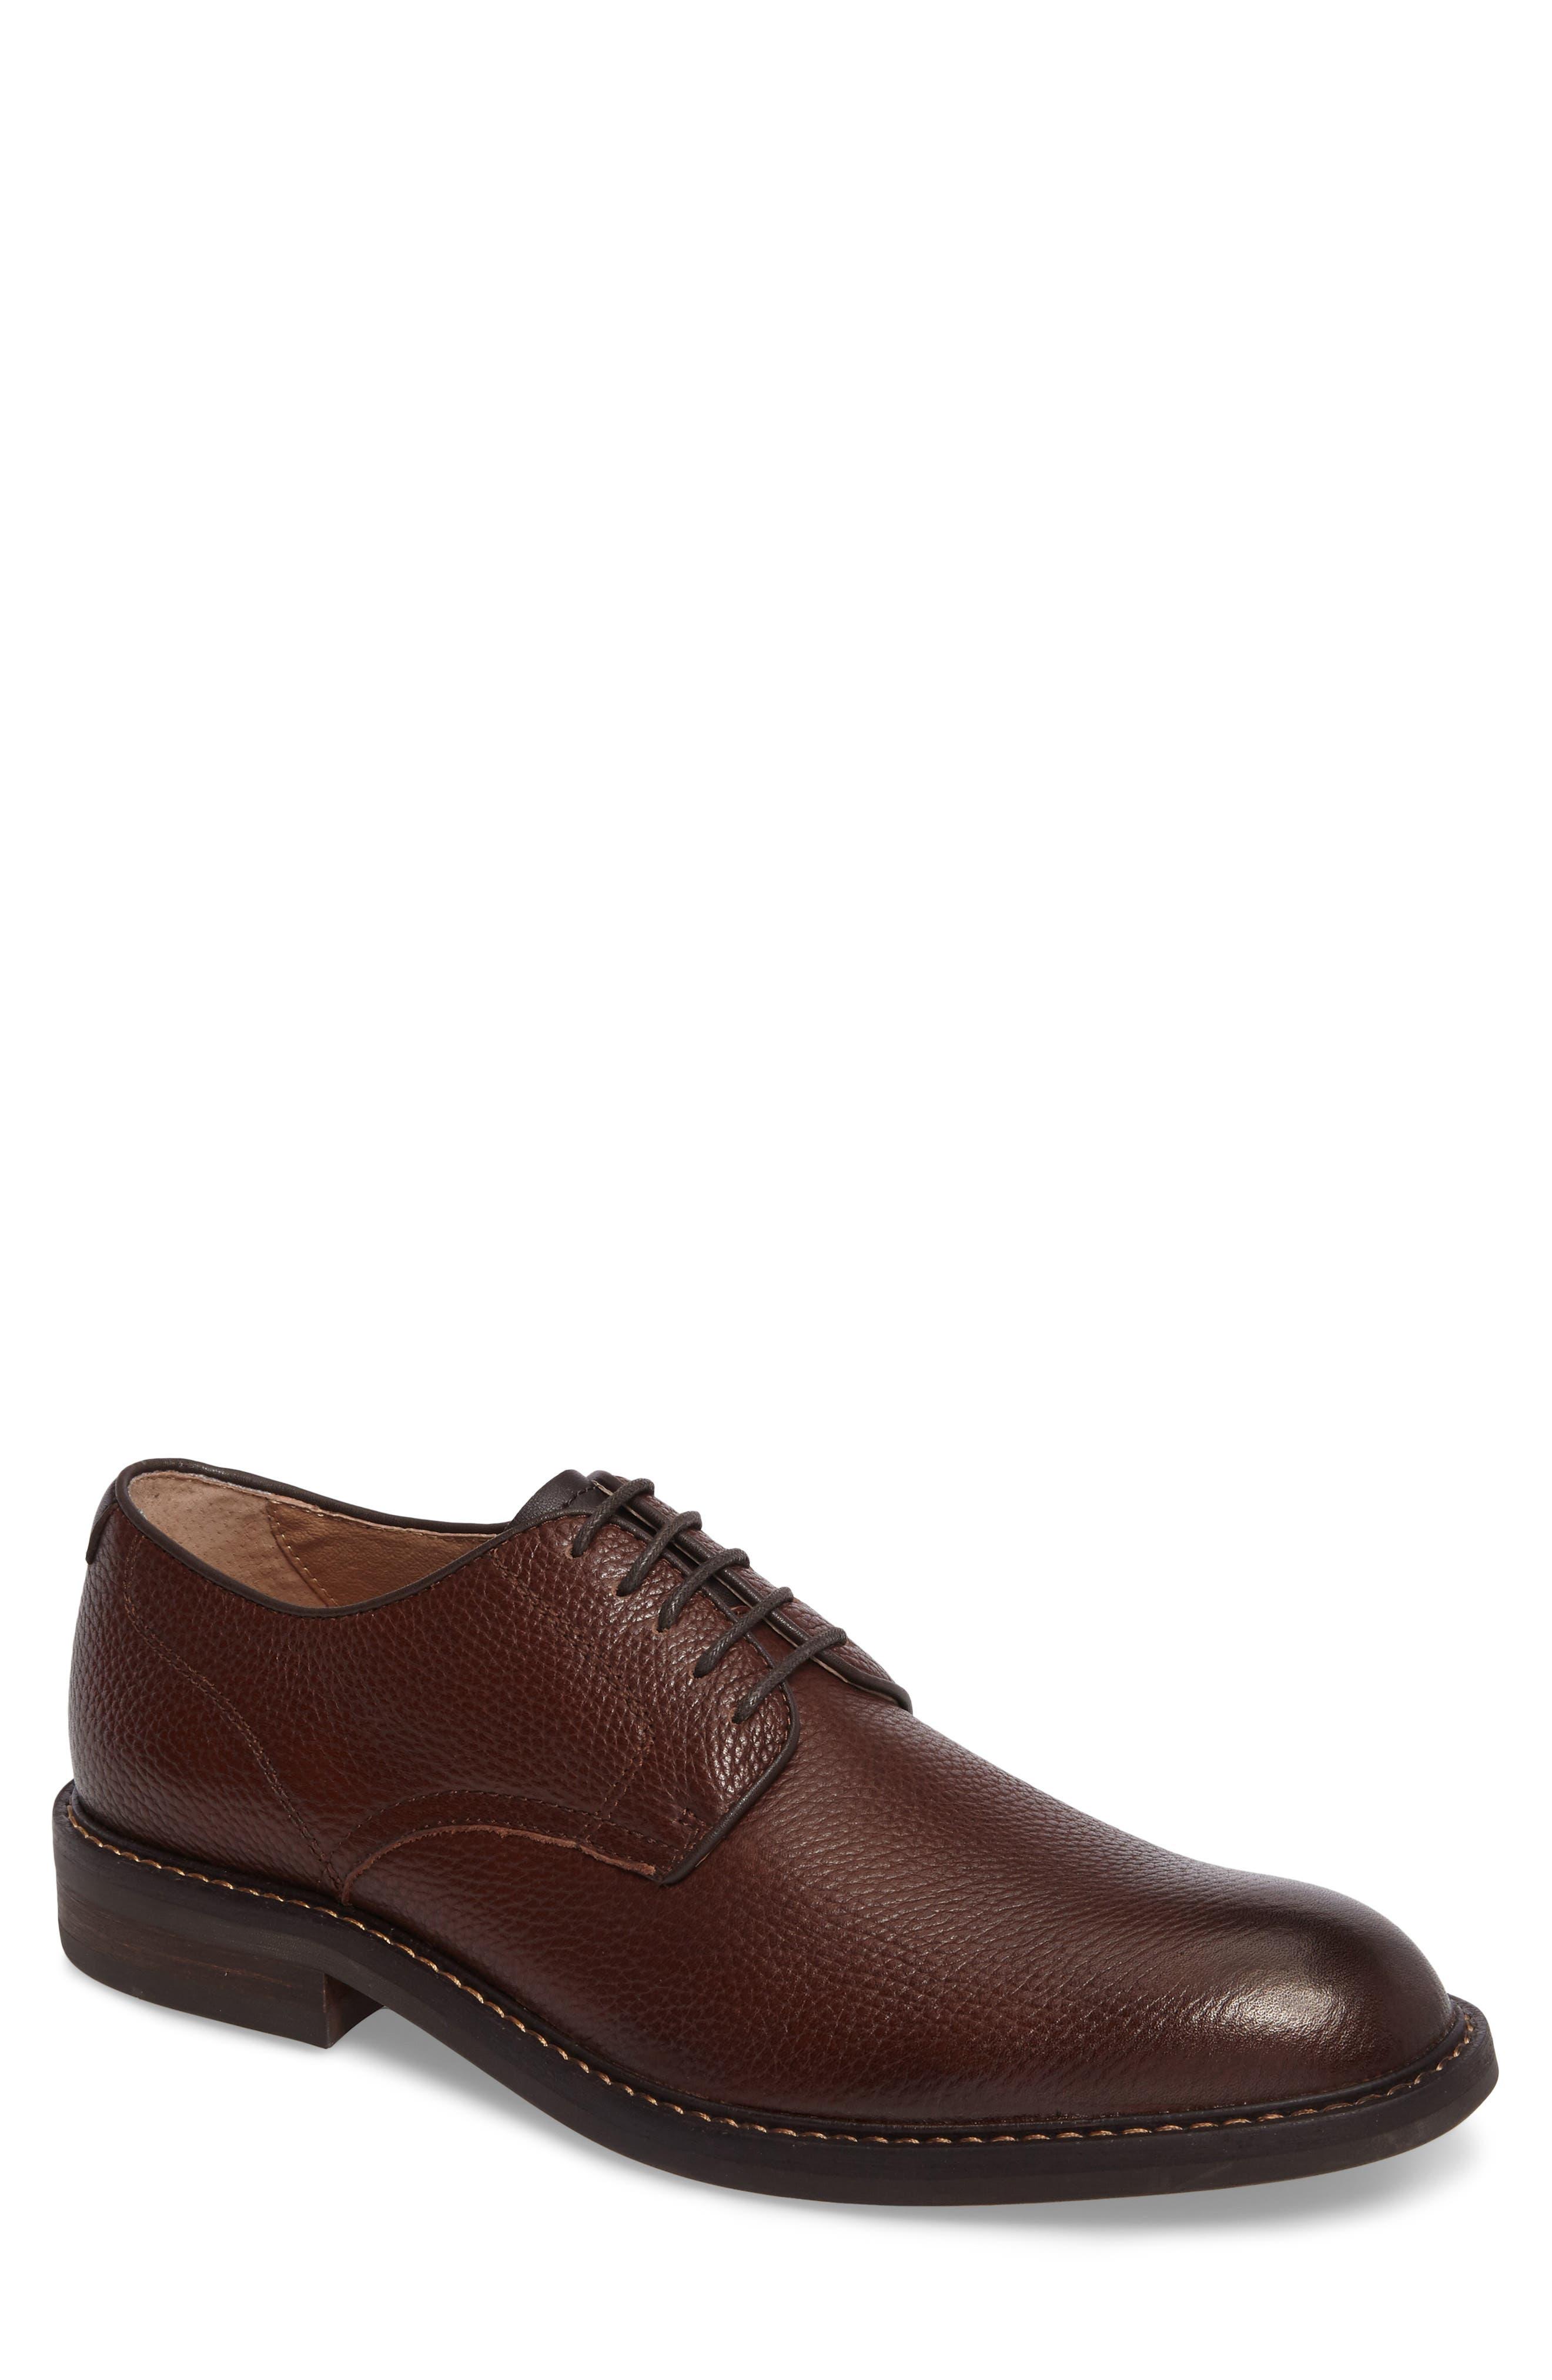 Alternate Image 1 Selected - 1901 Byron Buck Shoe (Men)